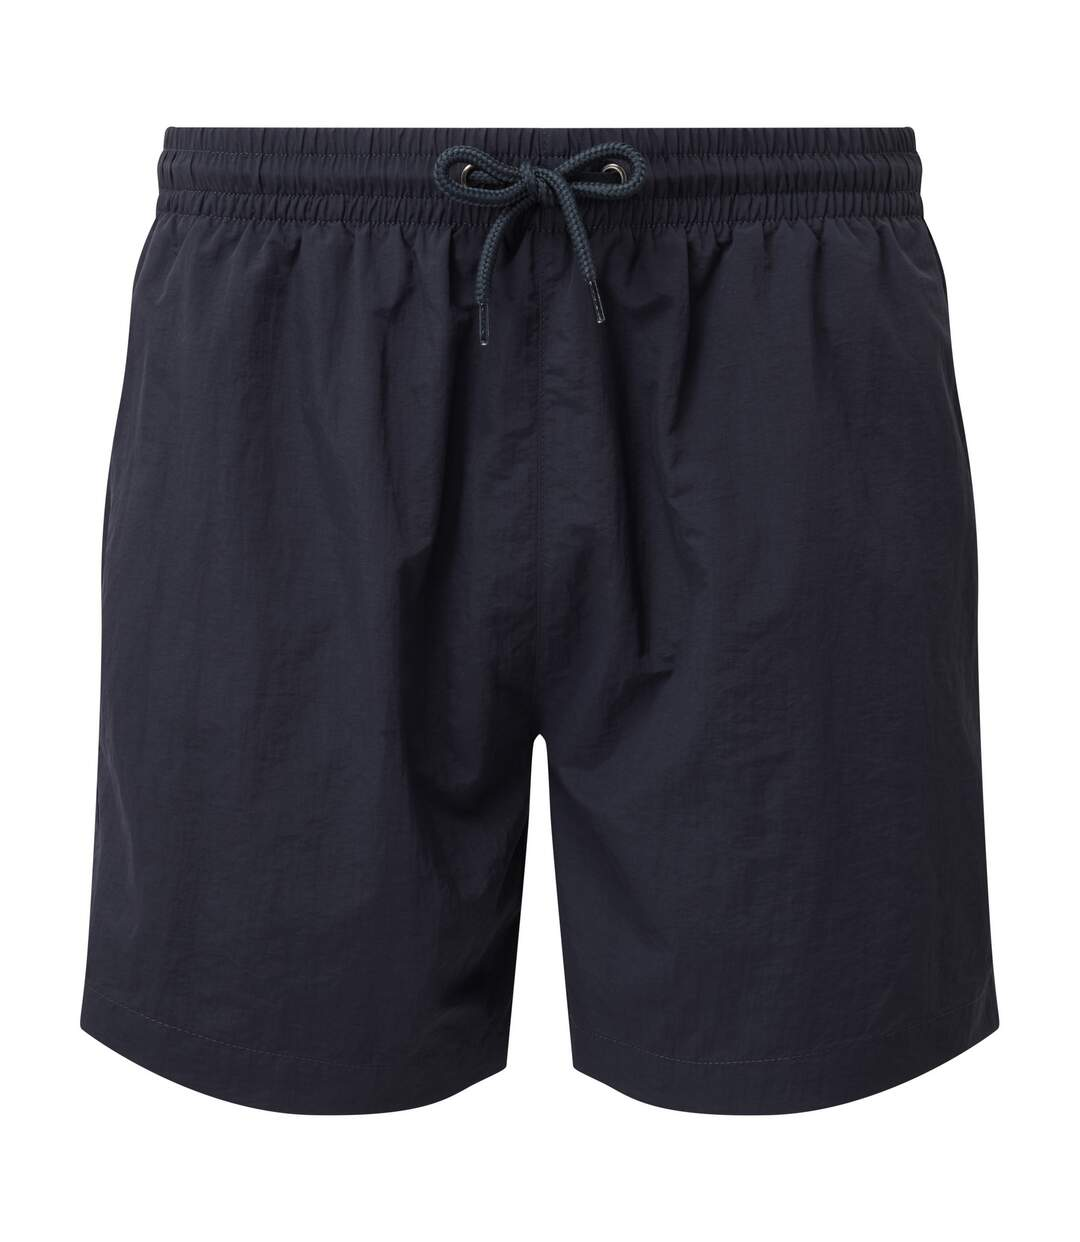 Asquith & Fox Mens Swim Shorts (Red/Red) - UTRW6242